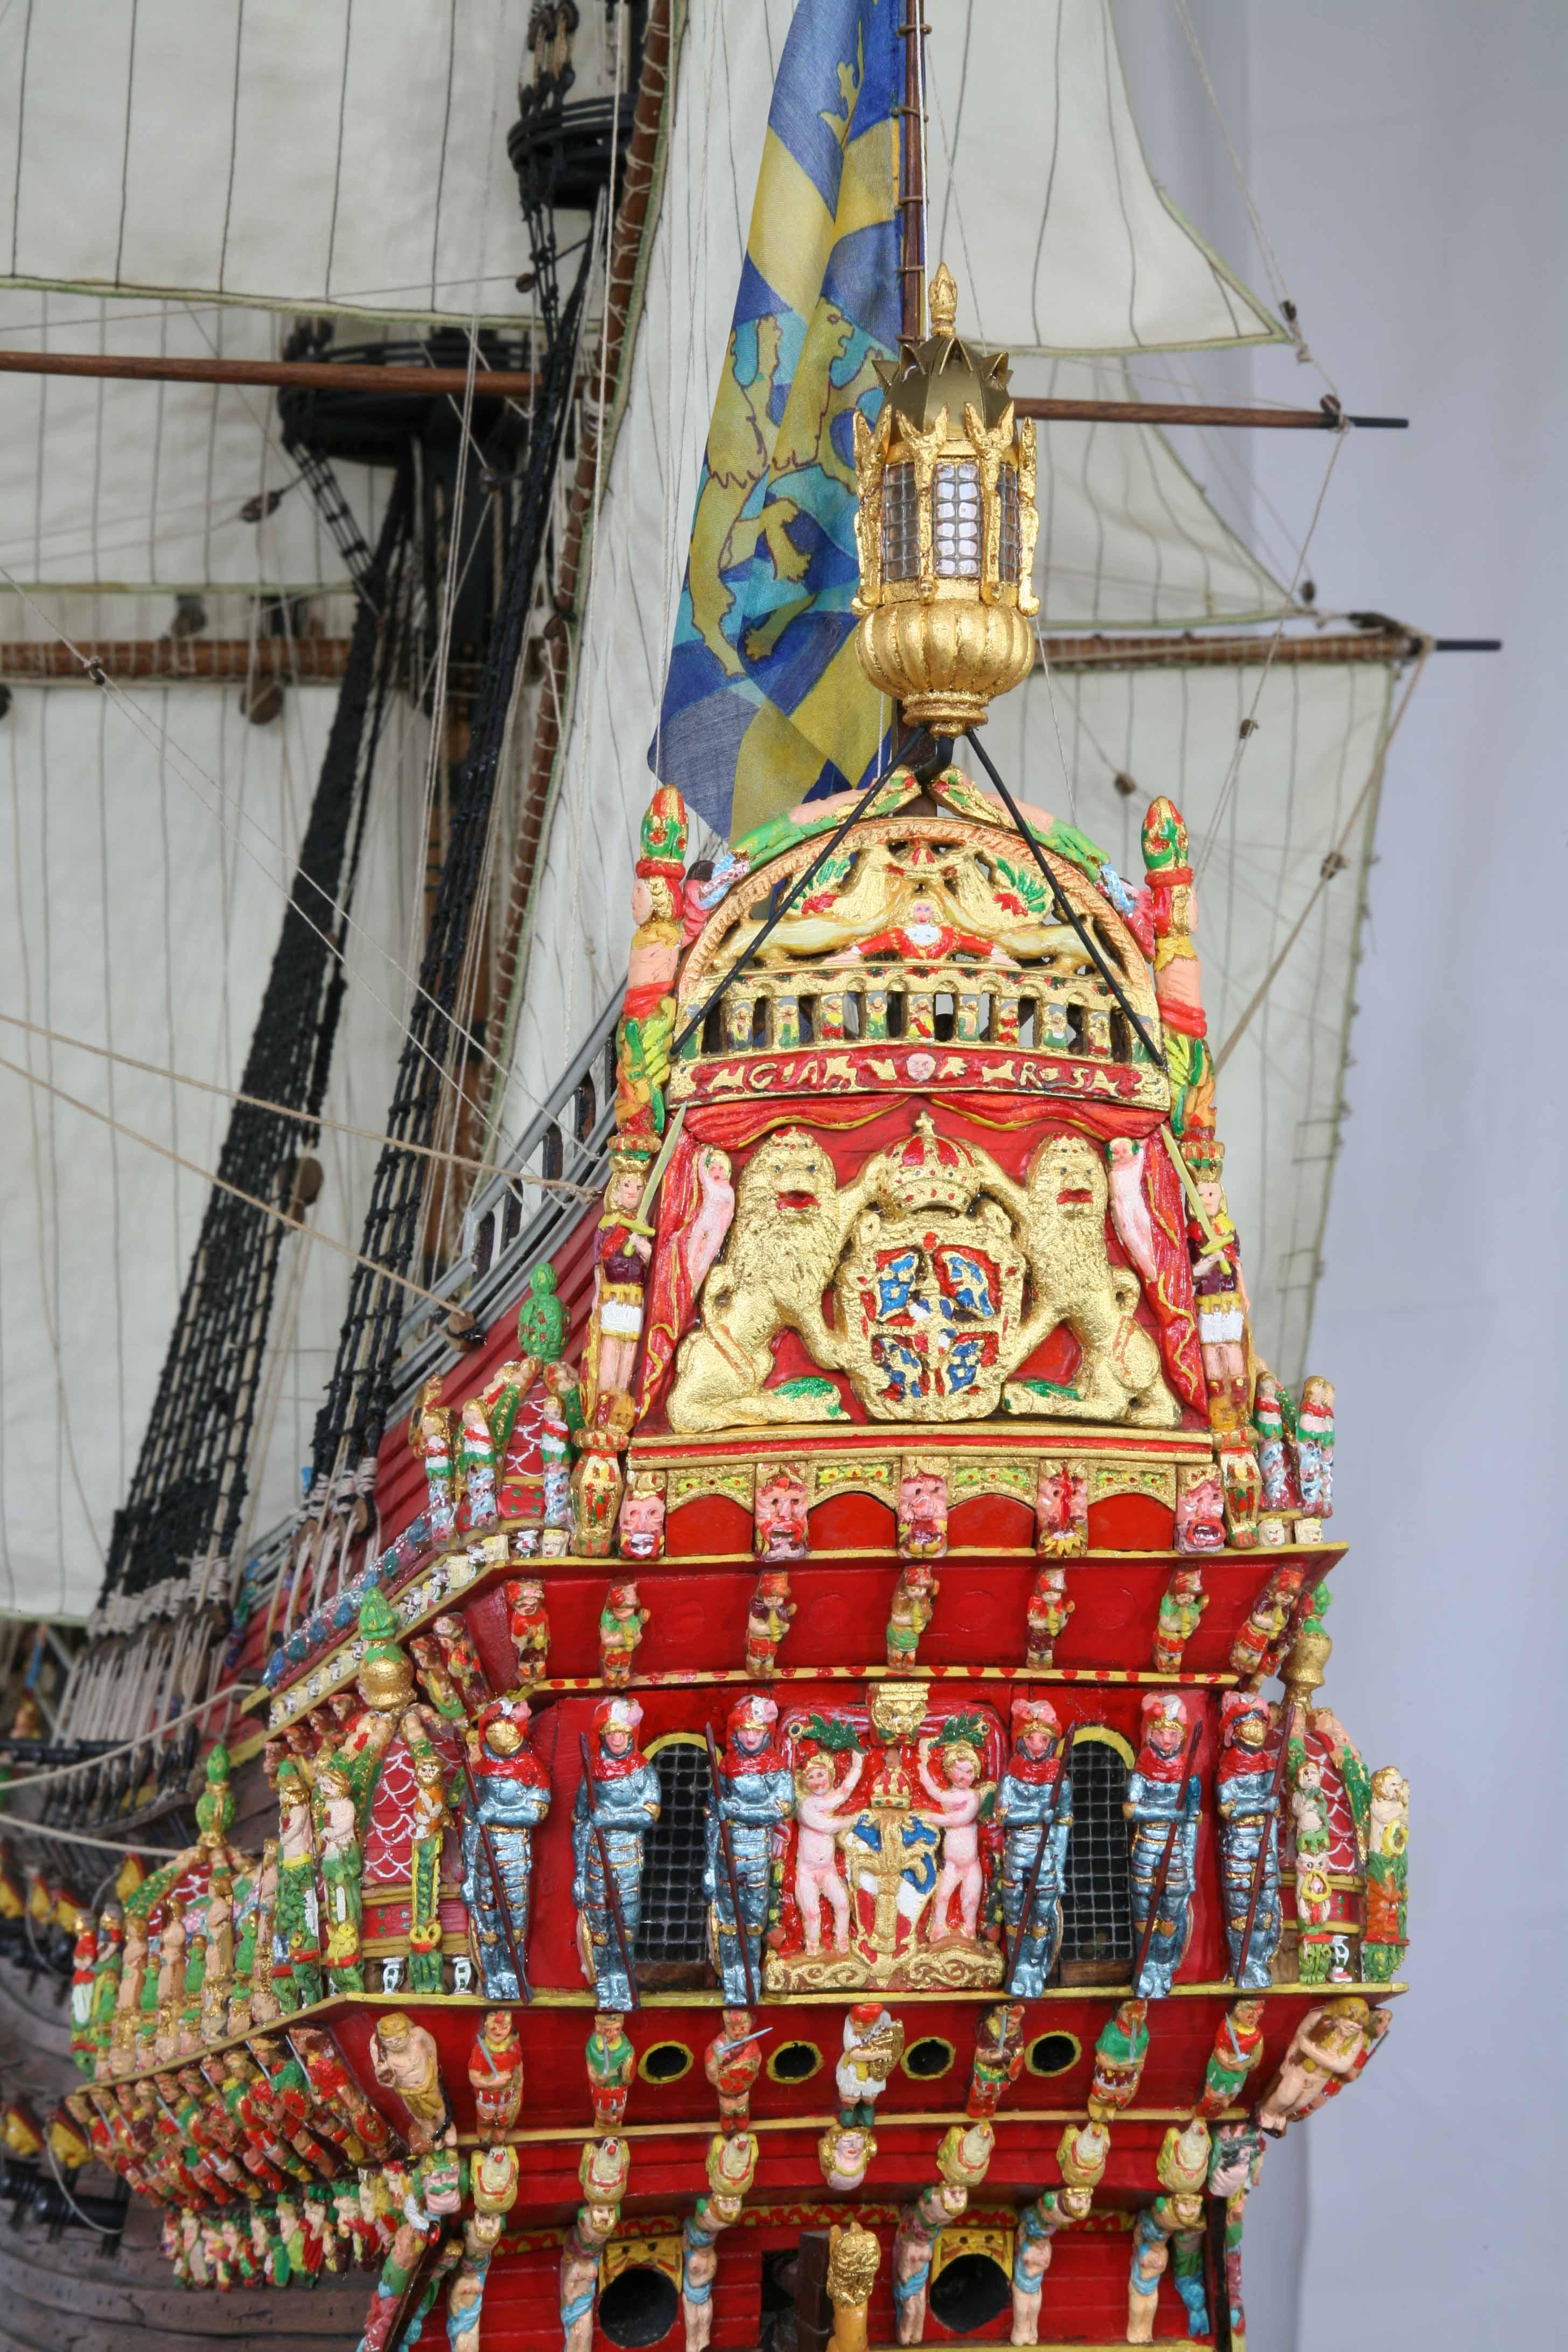 Swedish vasa of 1628 1 35 scale ship model for Vasa ship